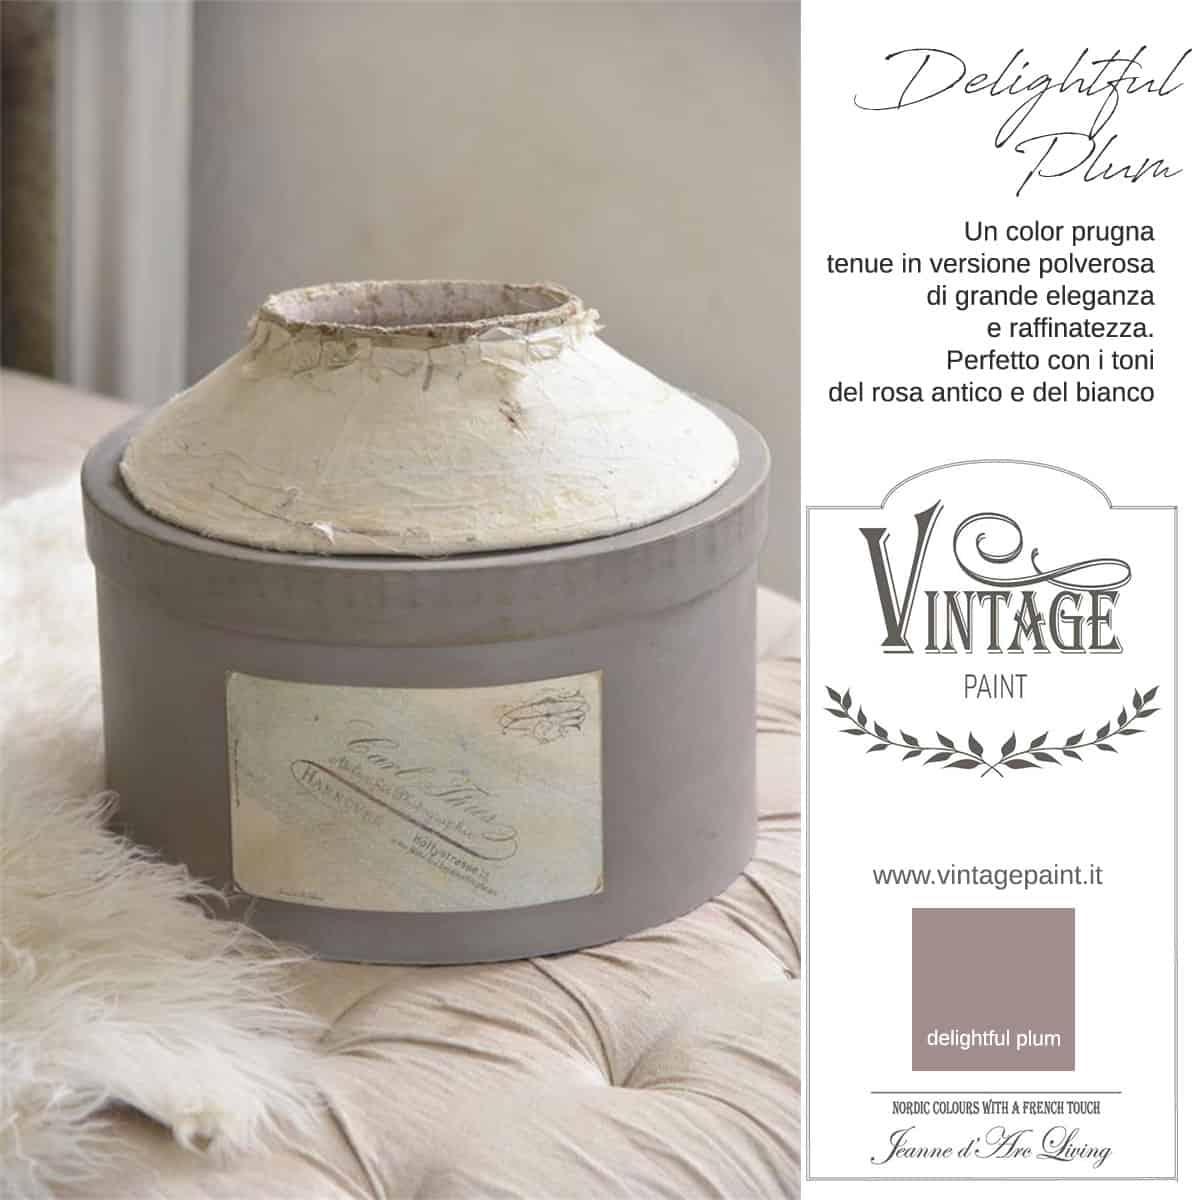 delightful plum viola prugna vintage chalk paint vernici shabby chic autentico look gesso